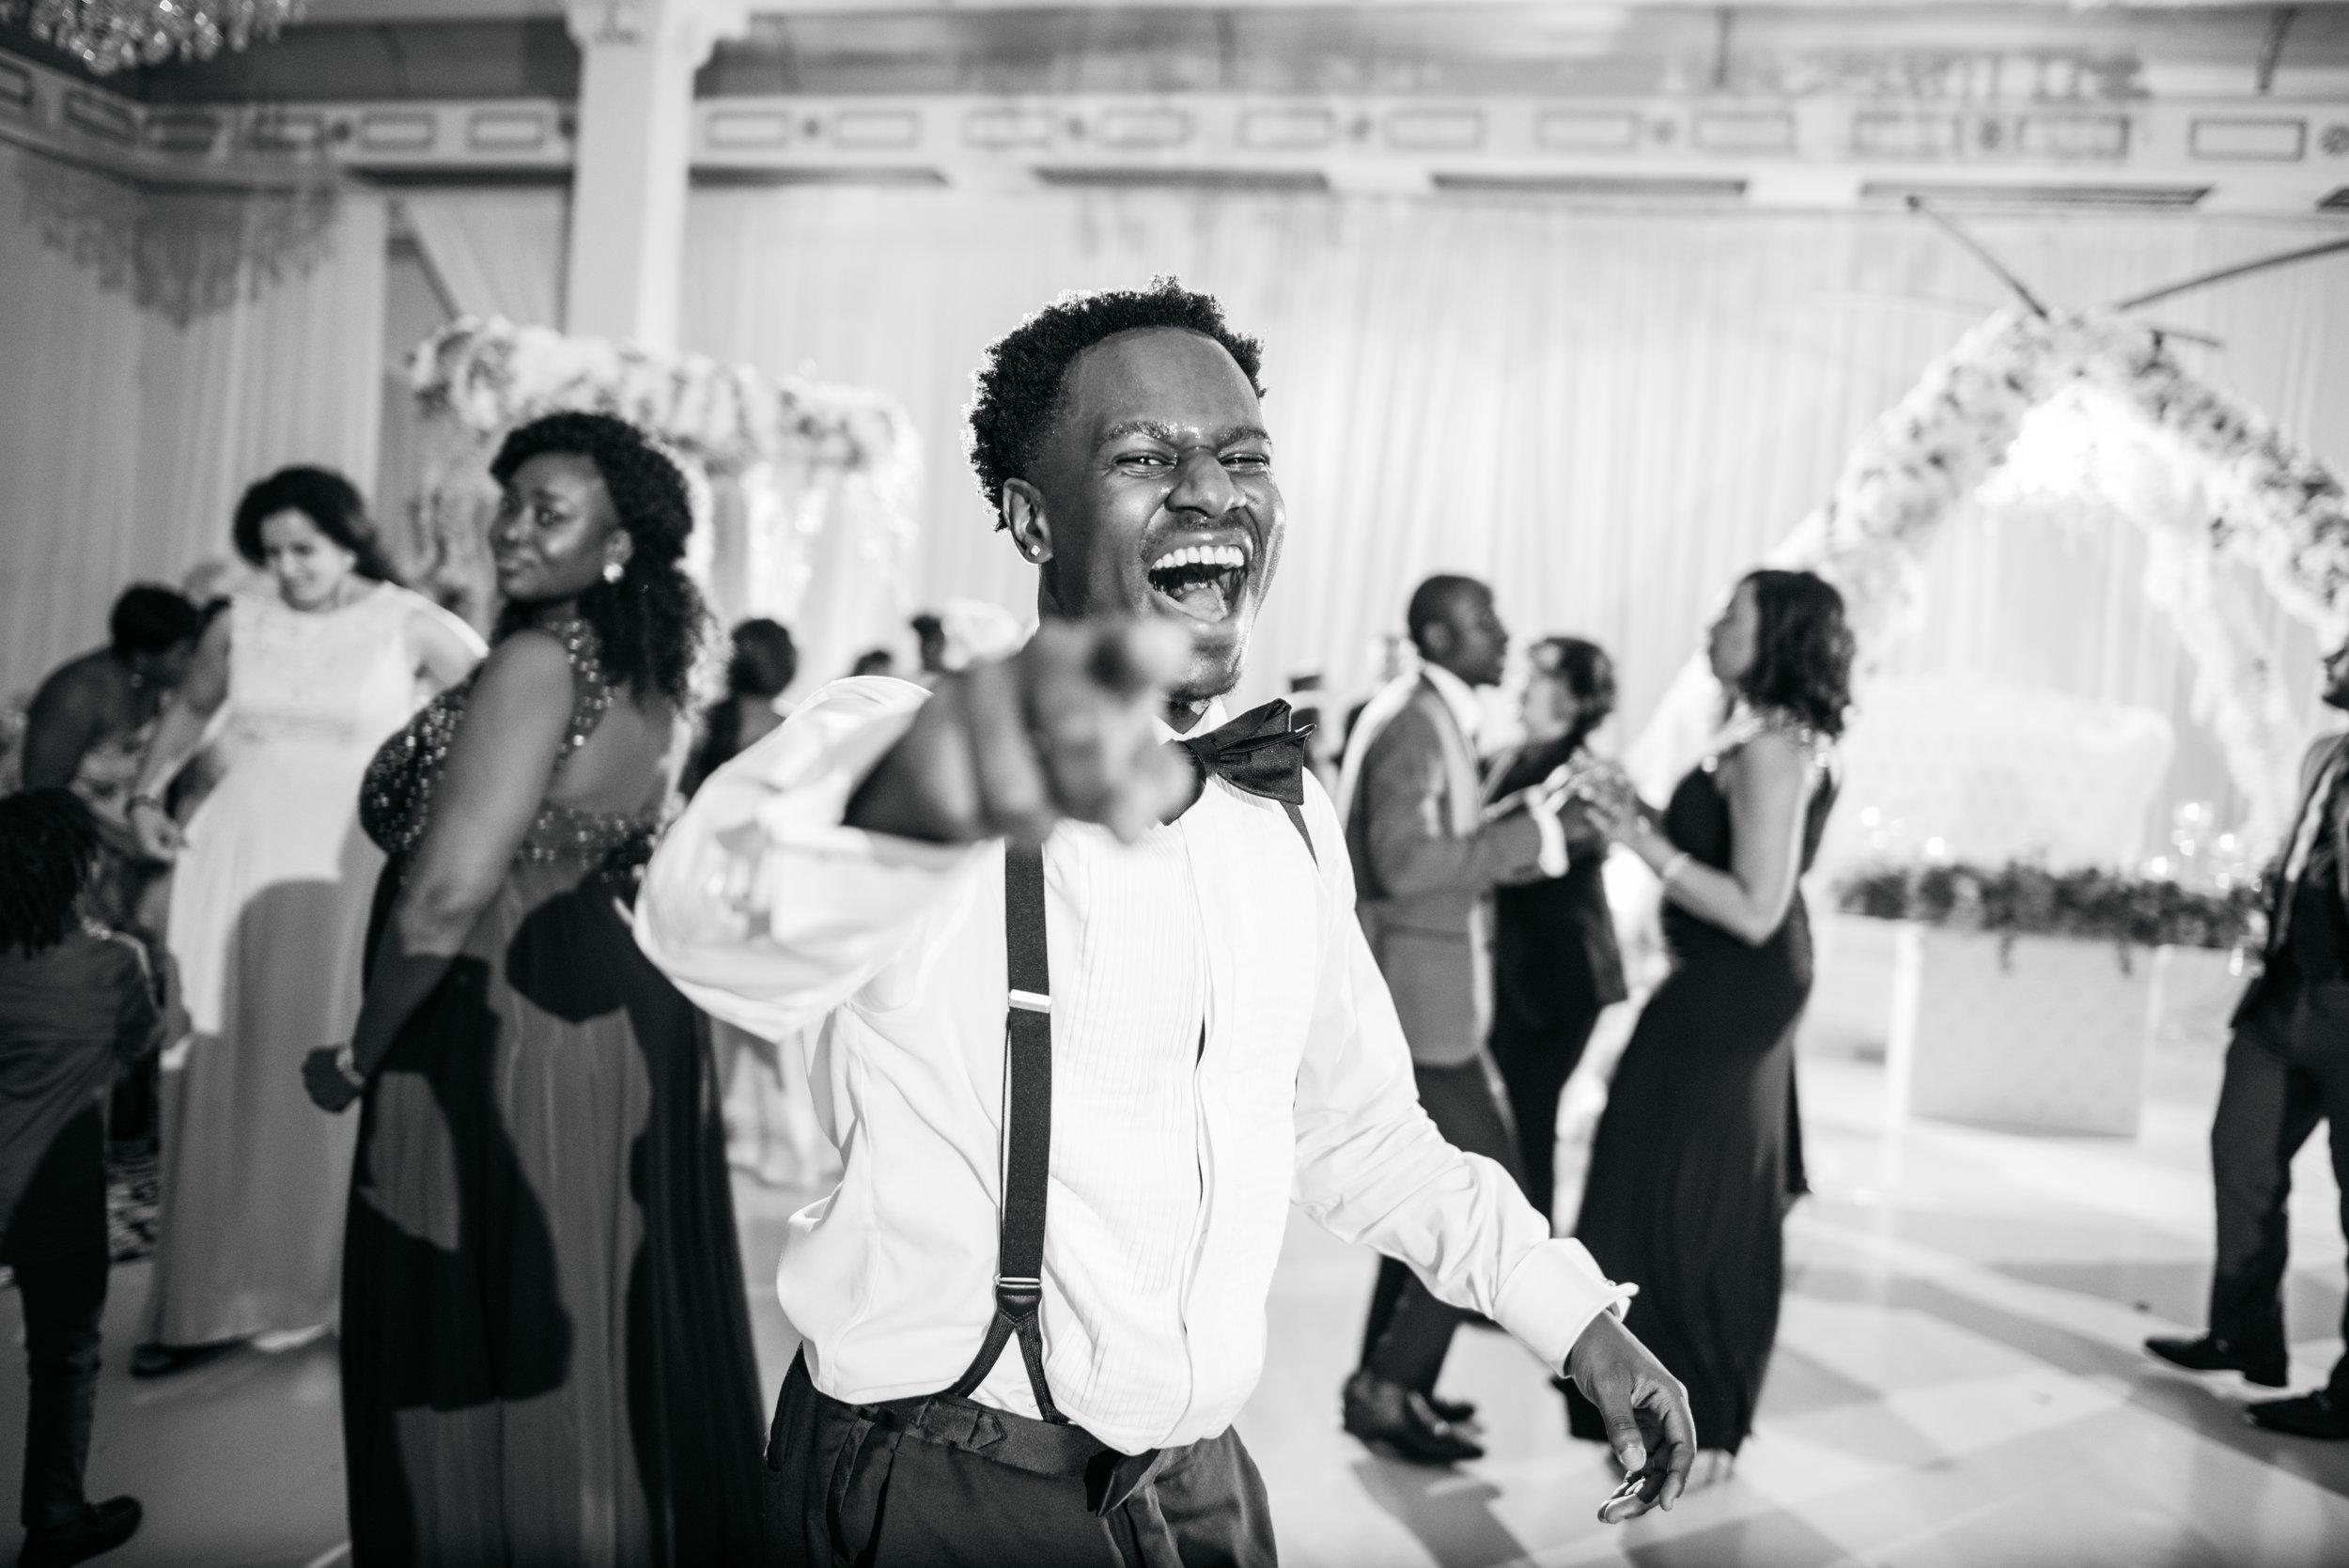 WeddingPhotos | NJPhotographer | Highlights-8-3.jpg